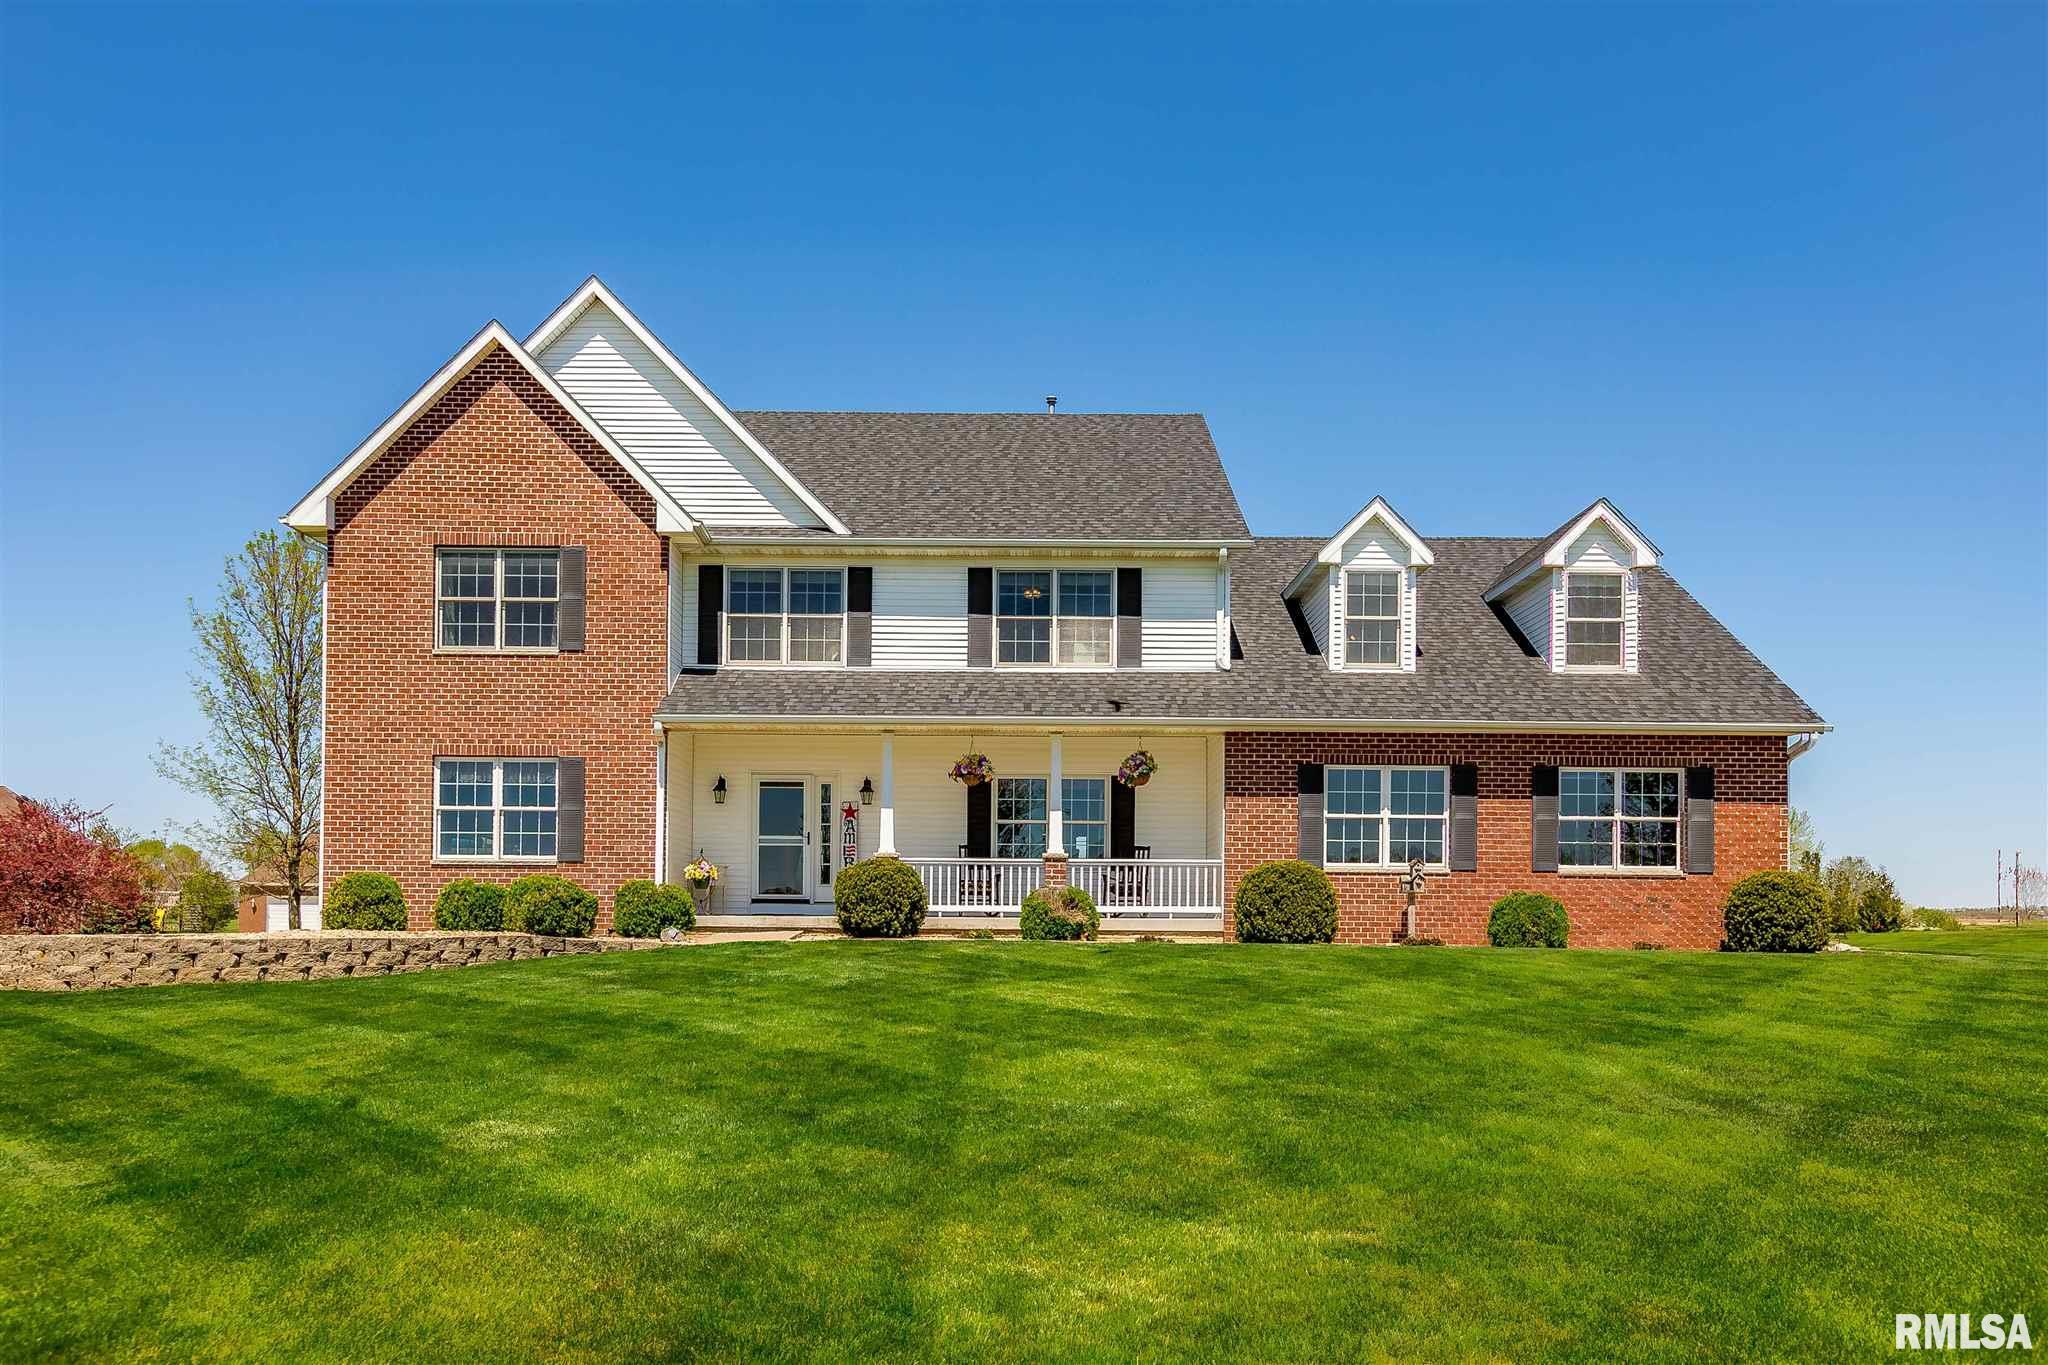 2610 244TH Property Photo - De Witt, IA real estate listing